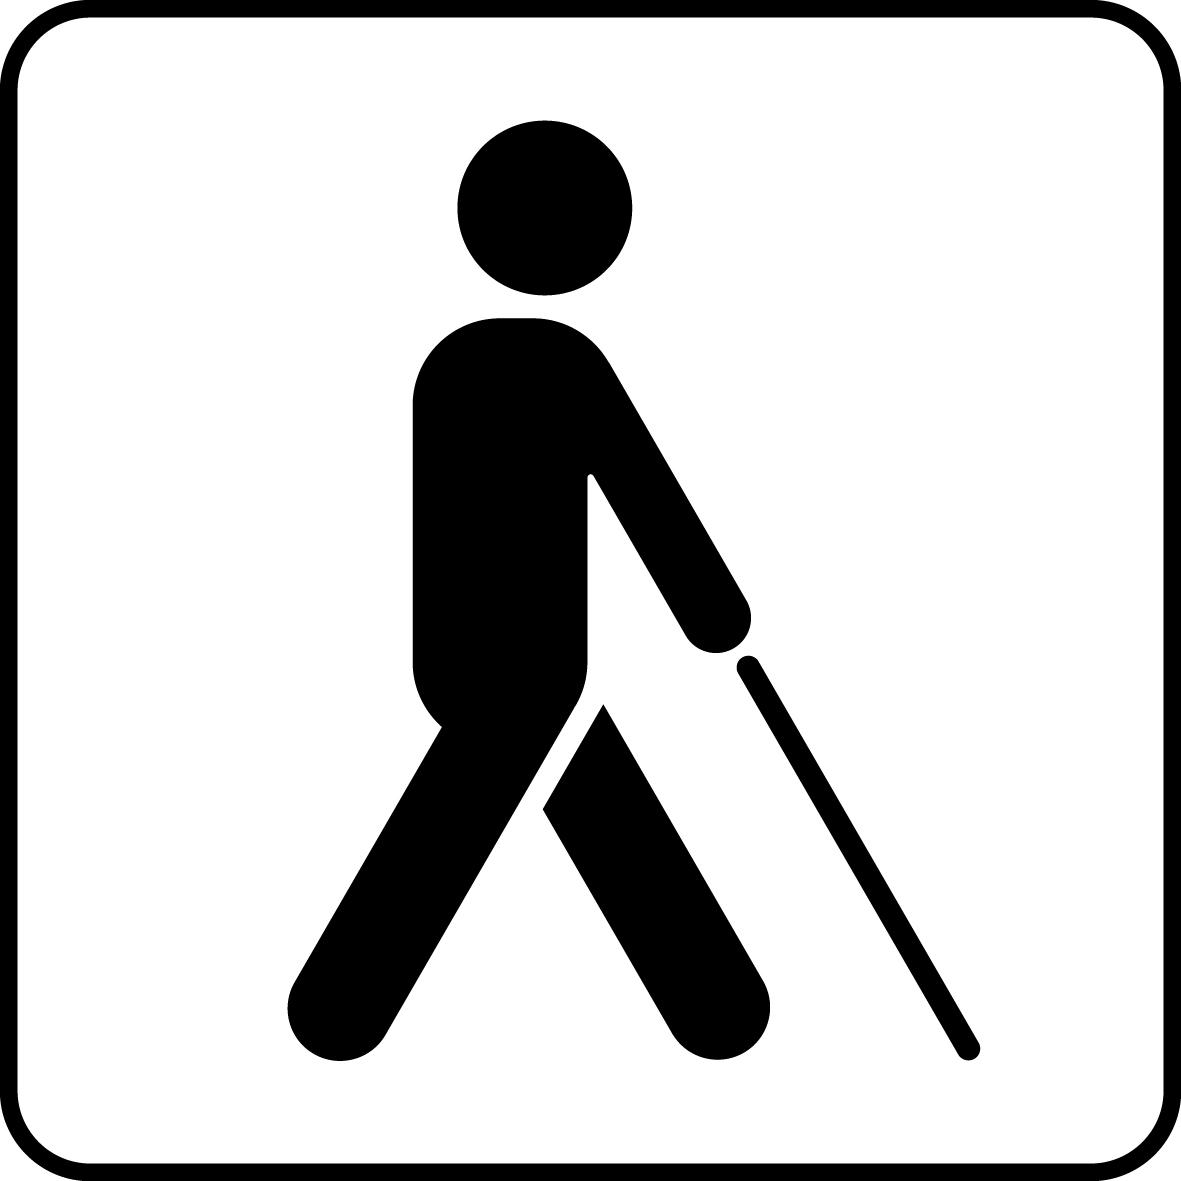 Universal Visually Impaired Symbol